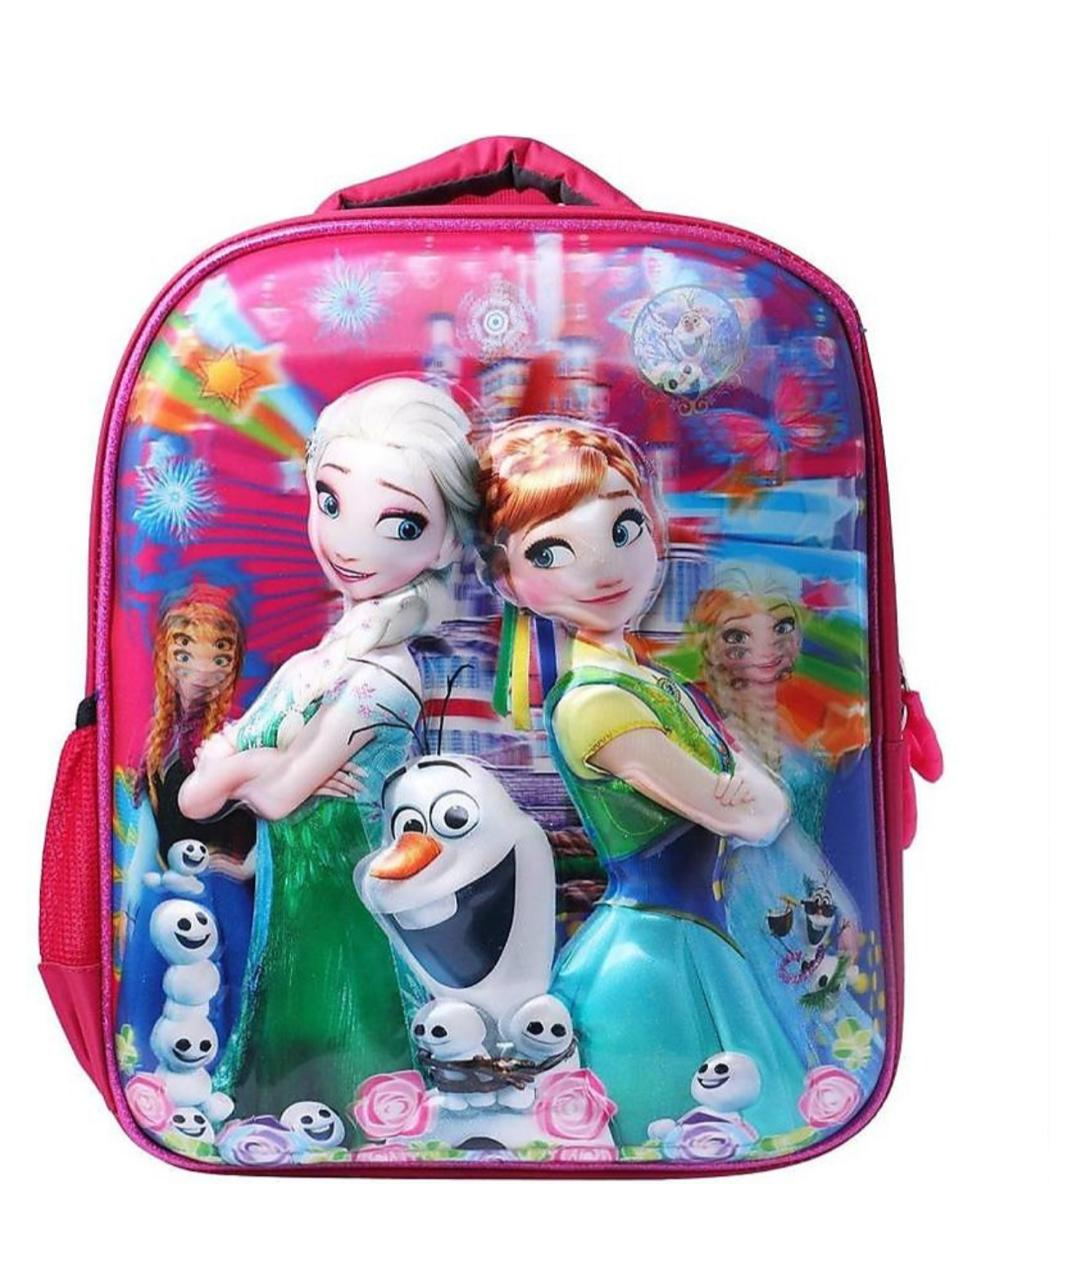 Proera Pink Bella 3d Embossed 4 Ltrs Kids Backpack ,School Bag, Nursery Bag Shoulder Backpack For Kids